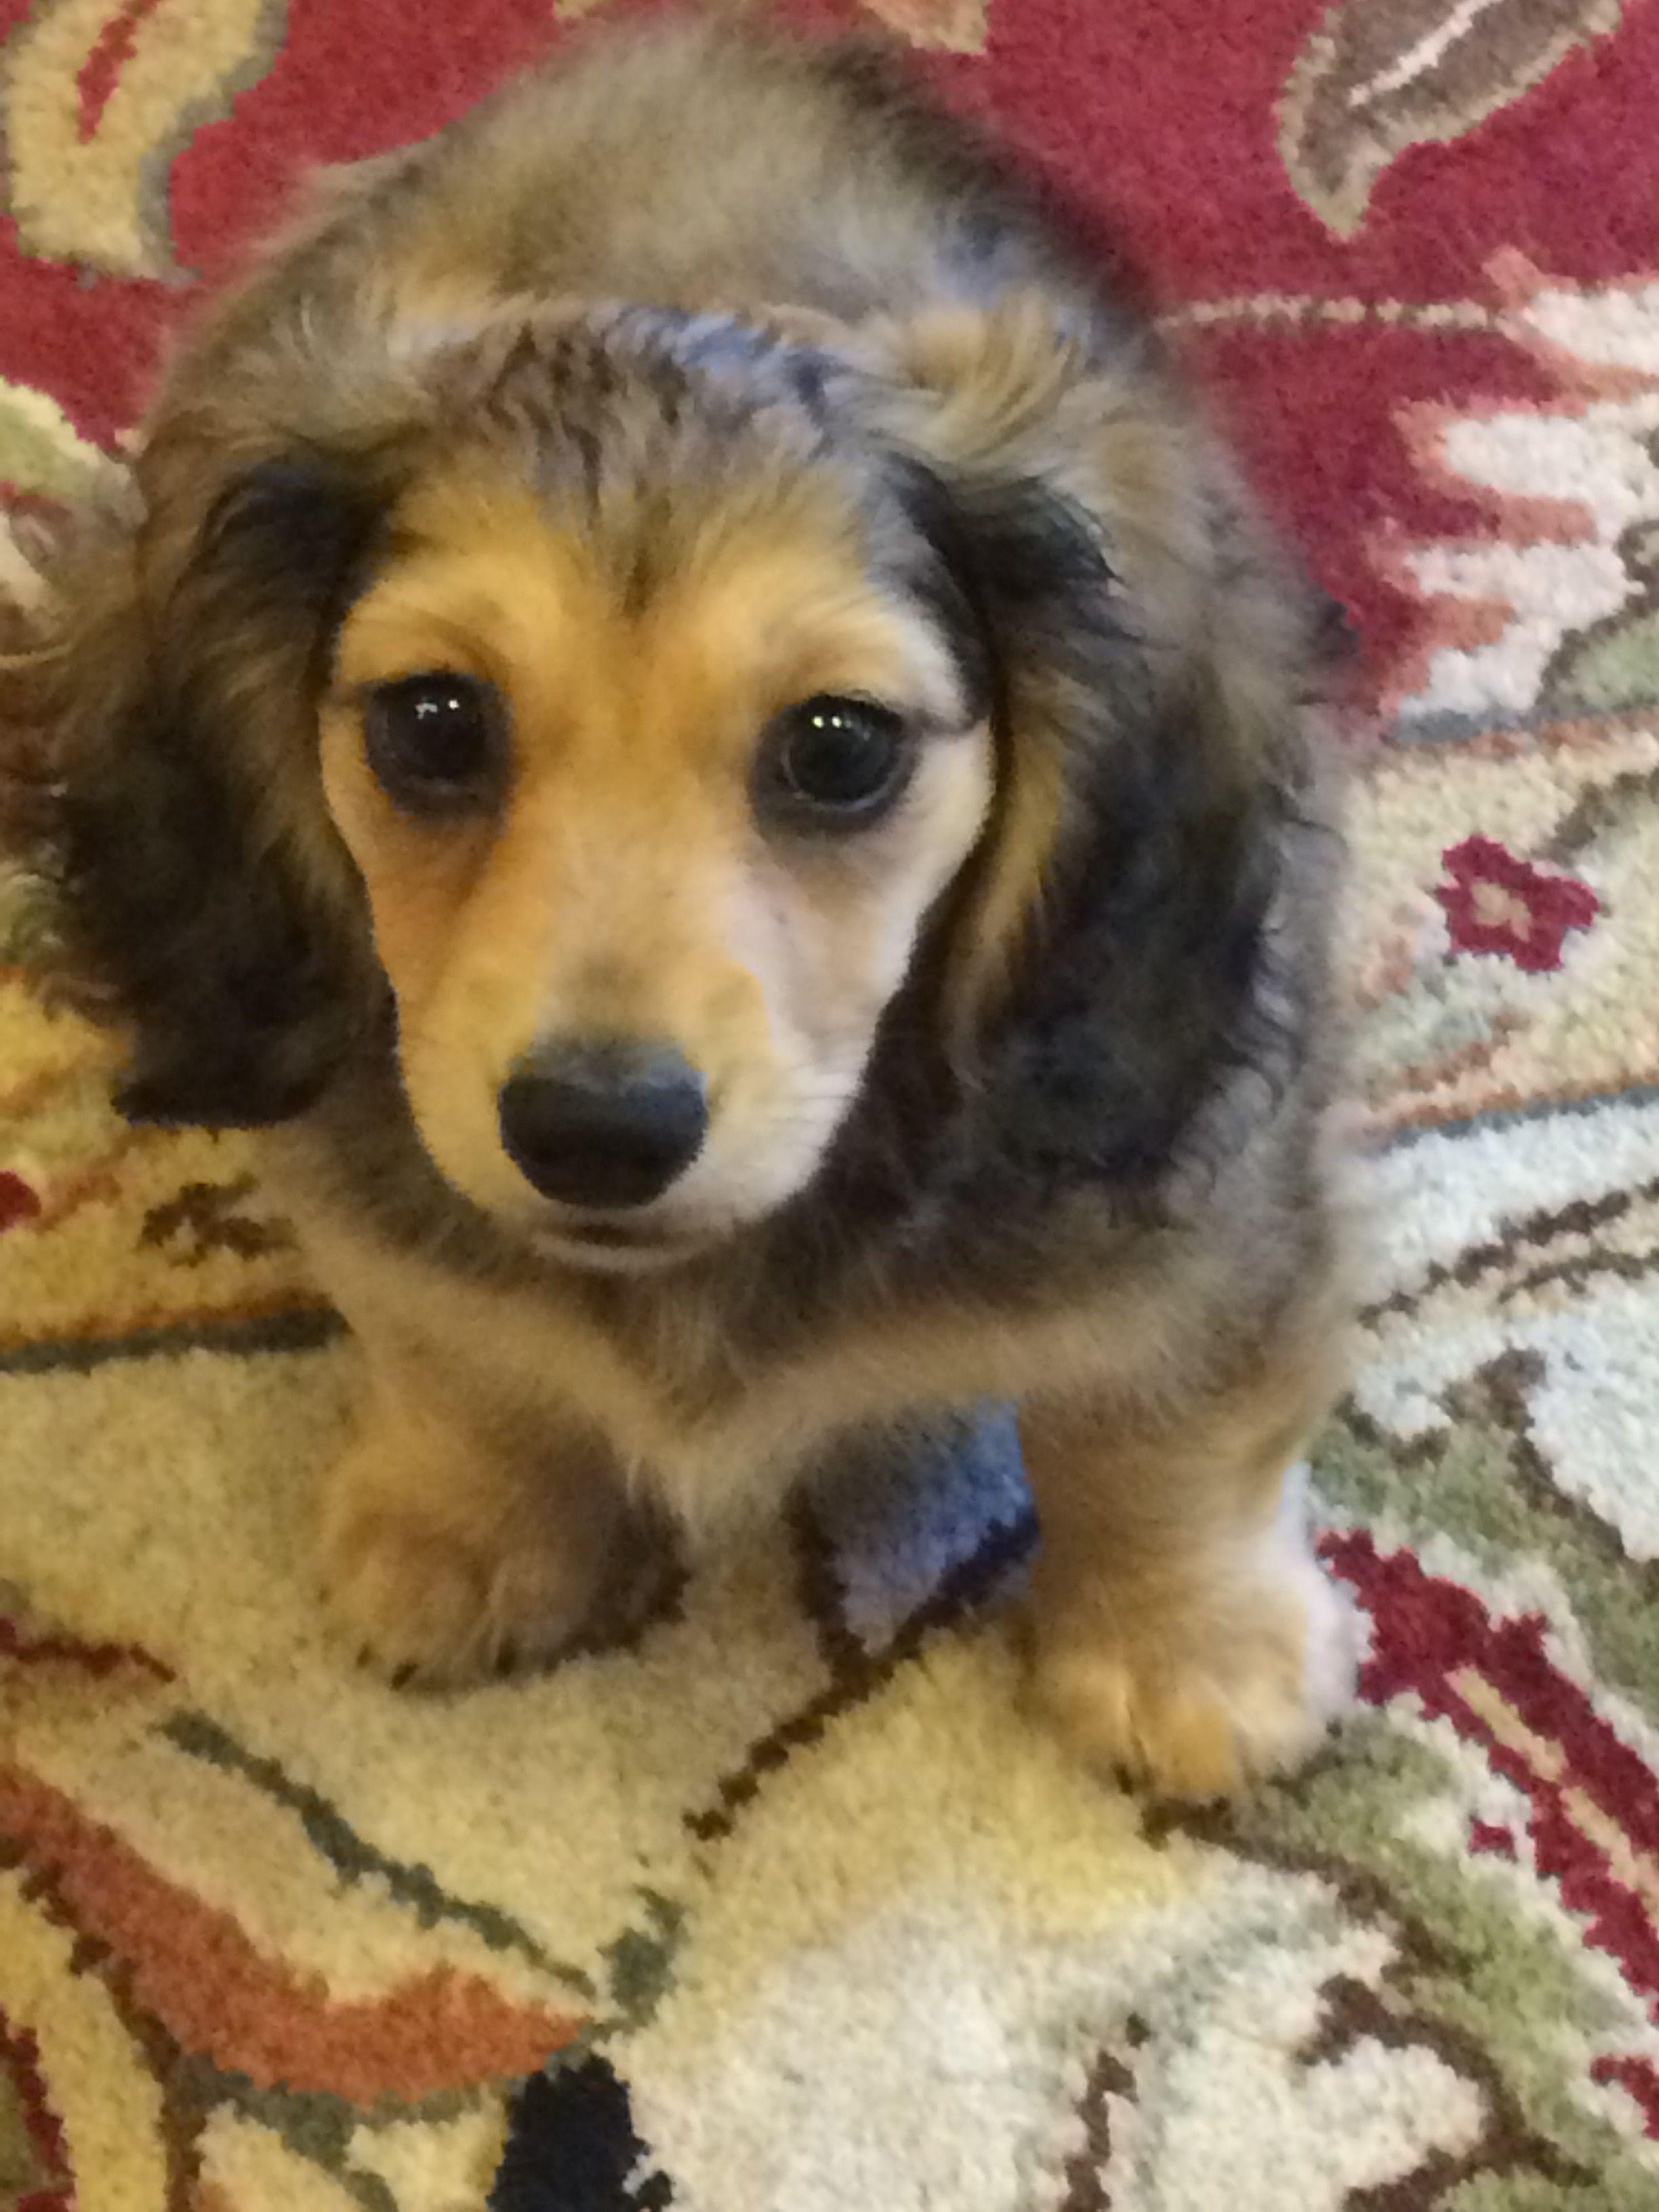 Dachshund puppy dachshund puppy dachshund puppies